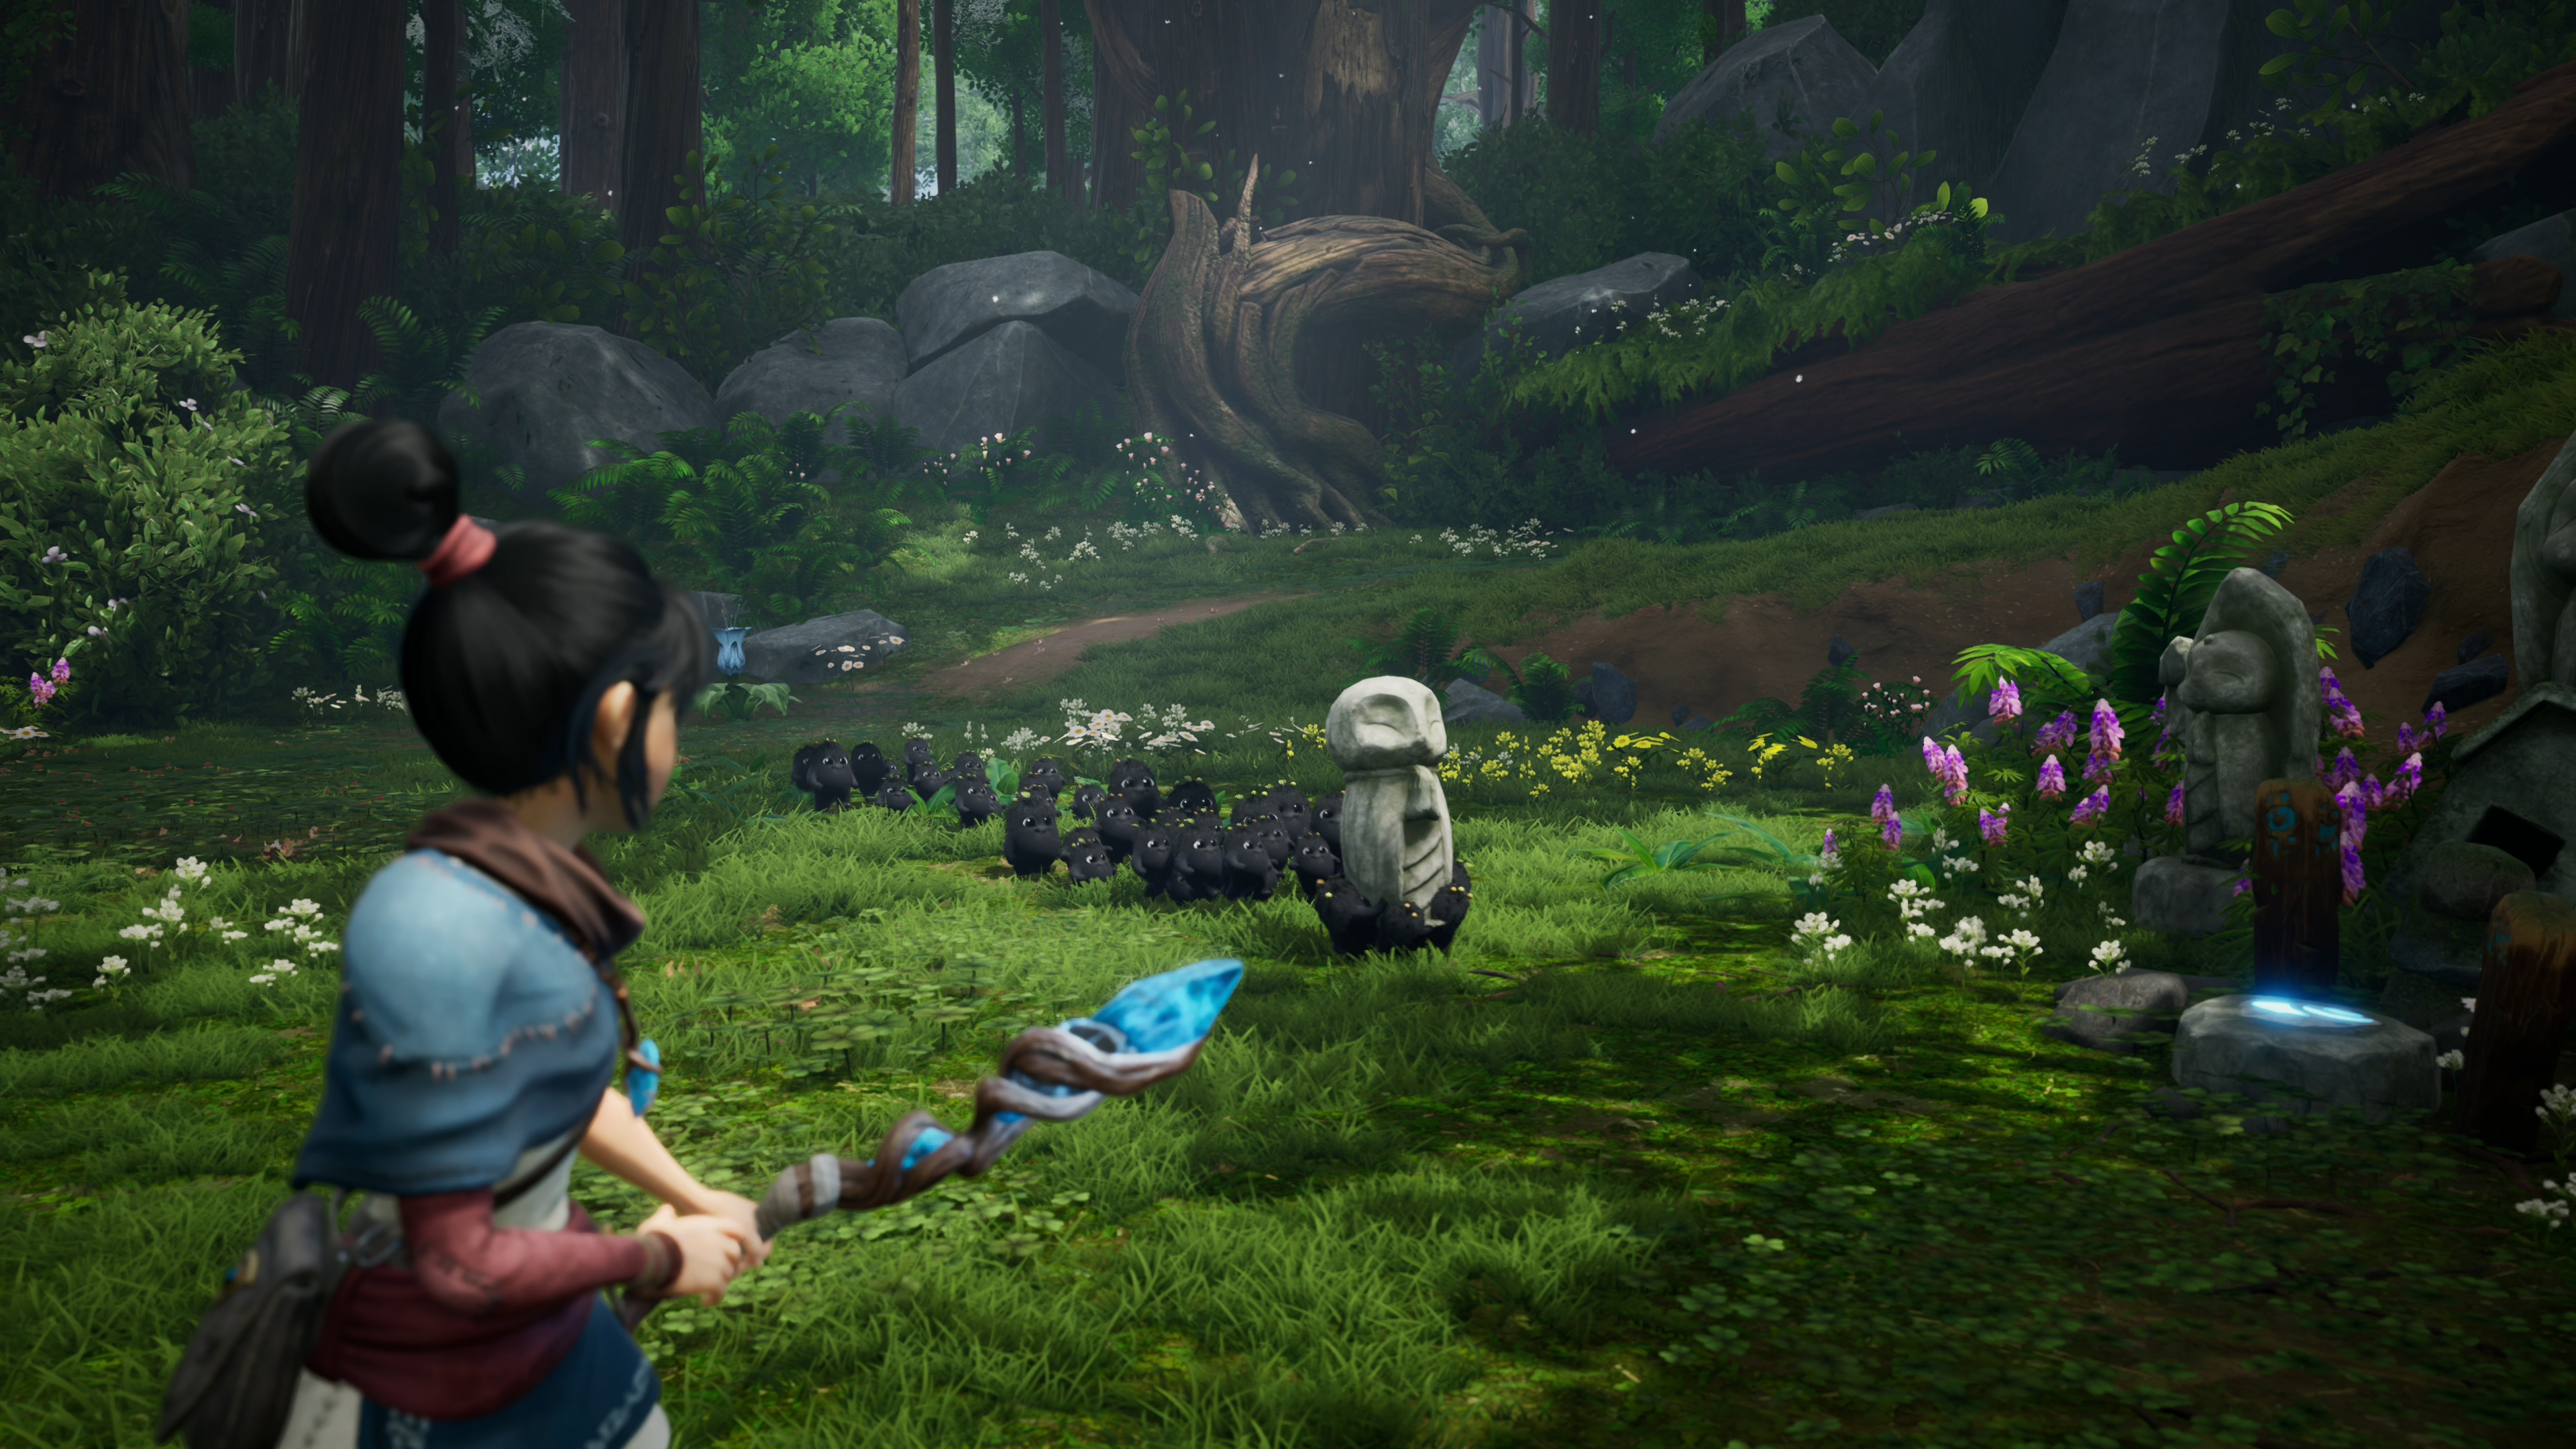 Скриншот №4 к Kena Bridge of Spirits Digital Deluxe PS4 and PS5